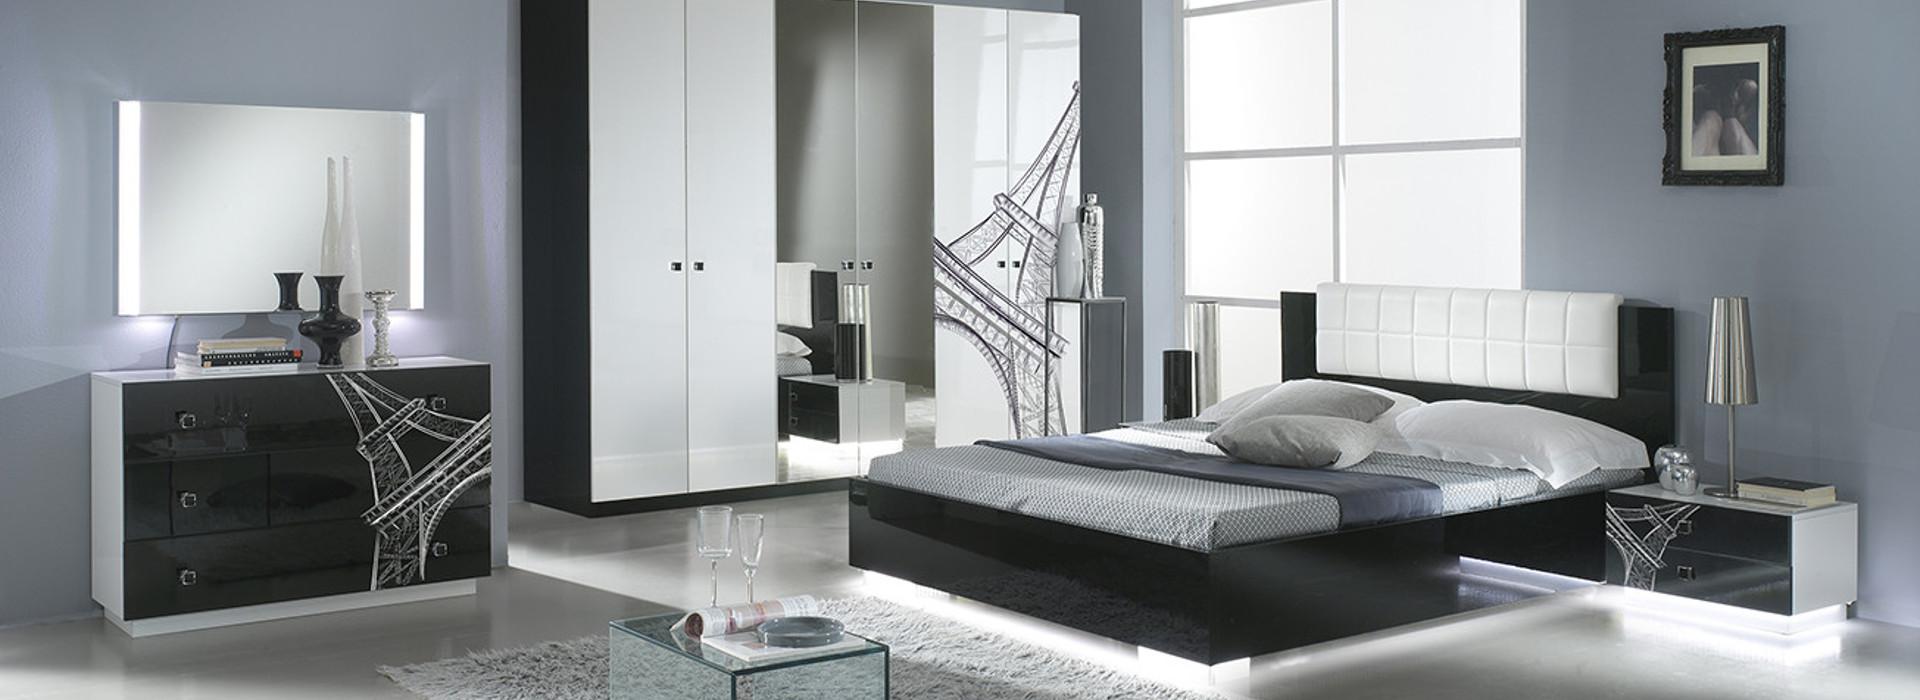 Kúsok Talianska v spálni